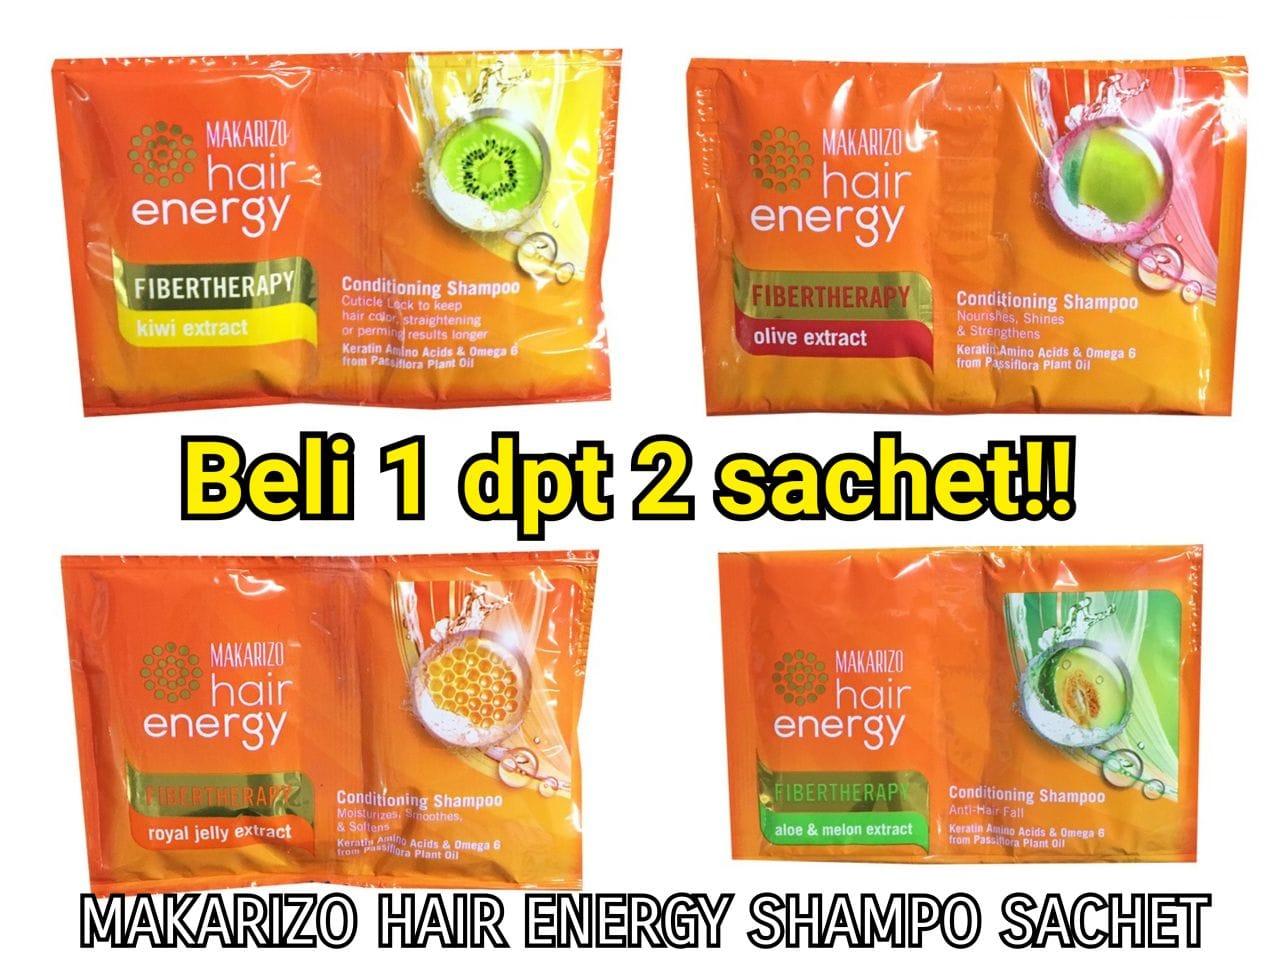 Makarizo Hair Energy Shampoo Sachet Aloe And Melon Extract 6 Sachets 60g X 4 Fibertherapy 30 Gr Pcs Review Daftar Harga Source Jual